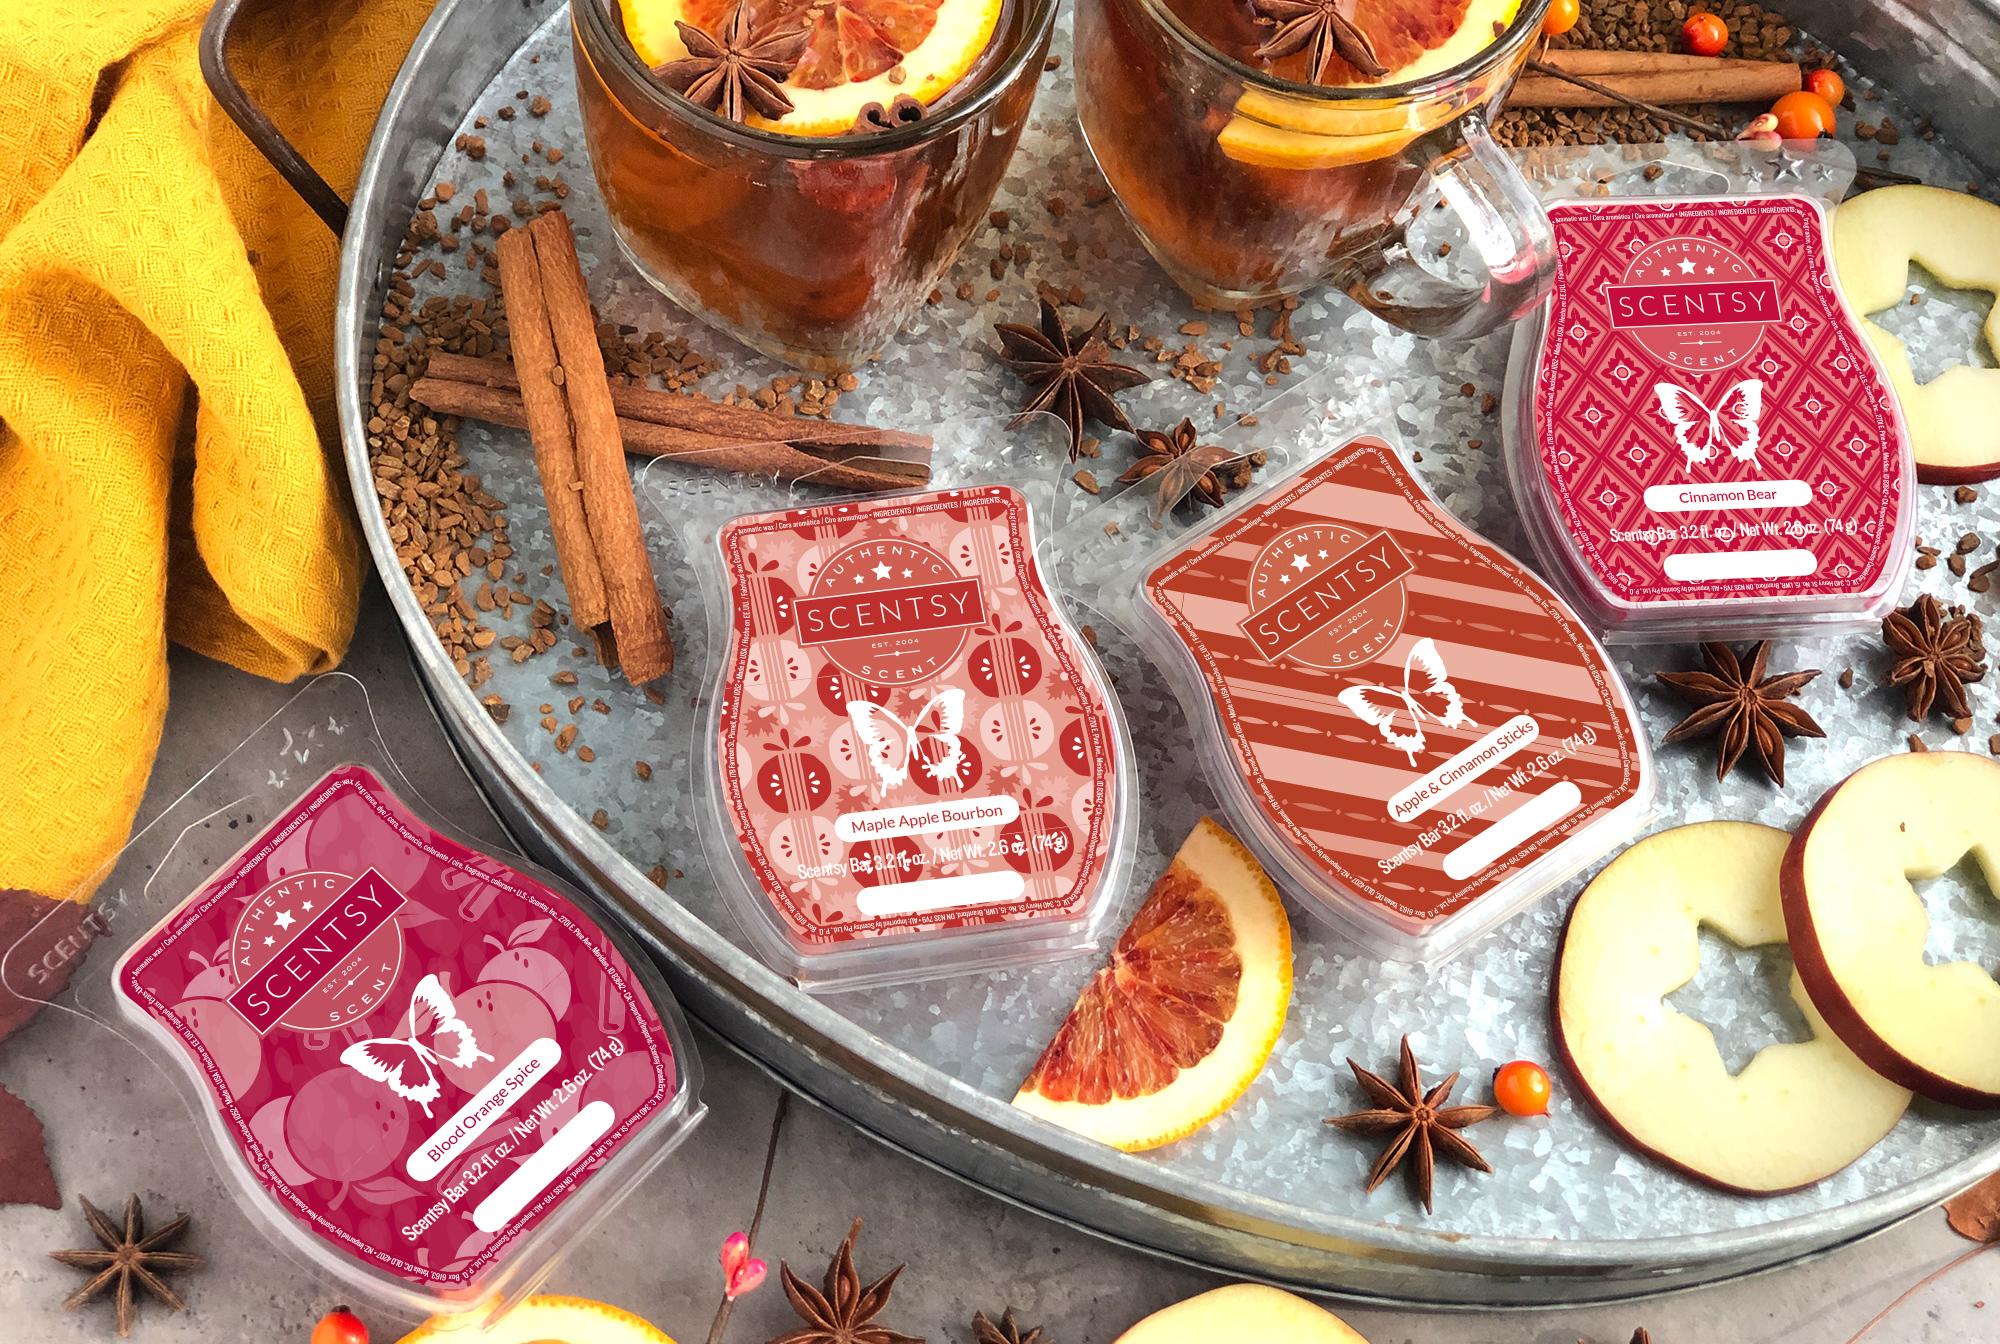 9-5 blog photoshoot featuring: Blood Orange Spice, Maple Apple Bourbon, Apple & Cinnamon Sticks, Cinnamon Bear